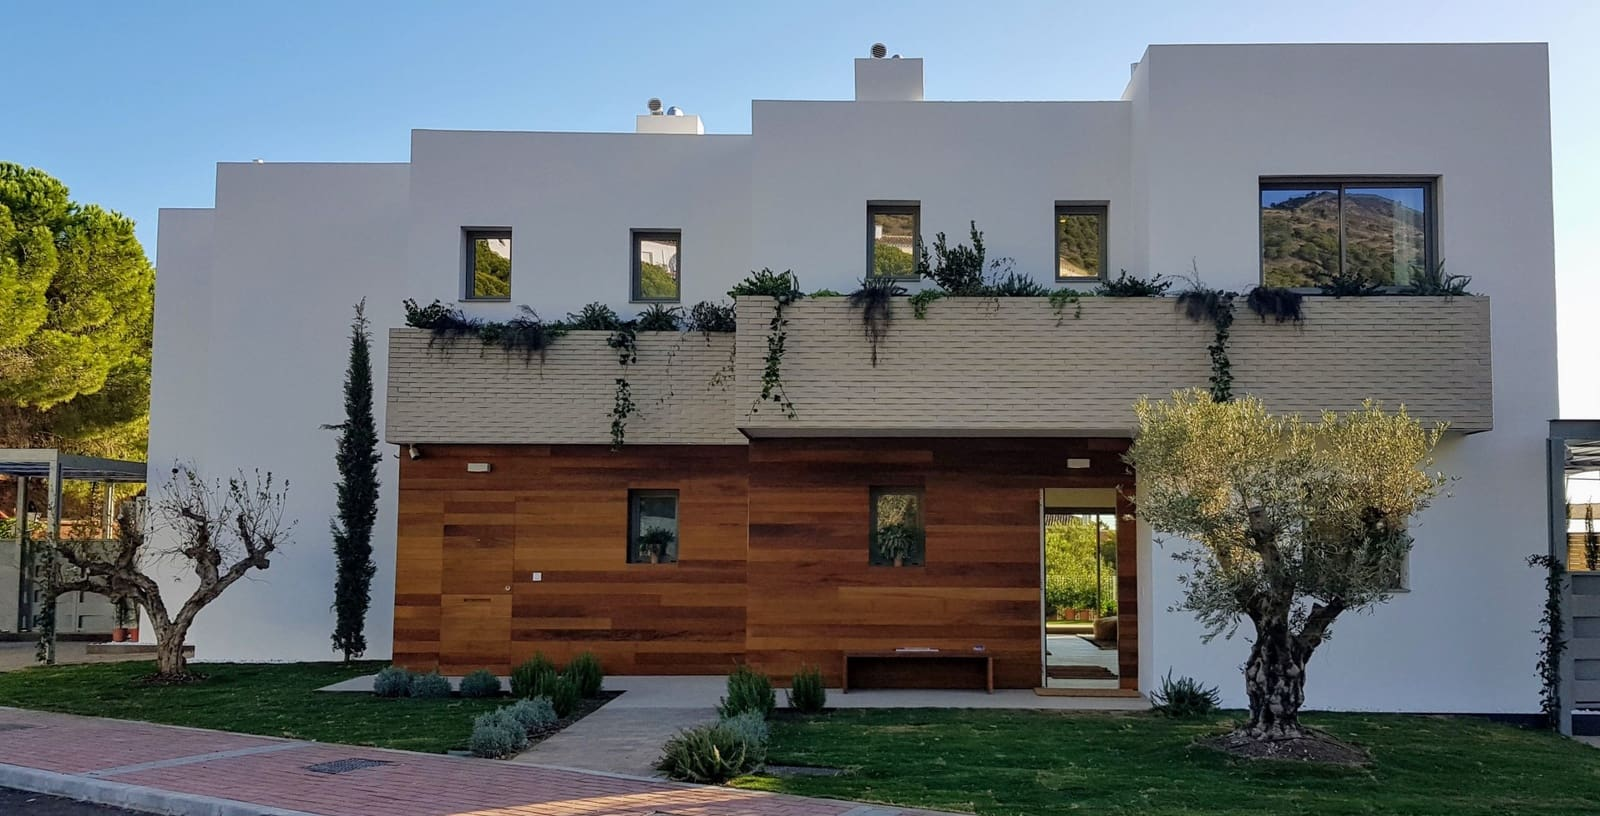 3 bedroom Semi-detached Villa for sale in Benalmadena with pool garage - € 475,000 (Ref: 4780820)